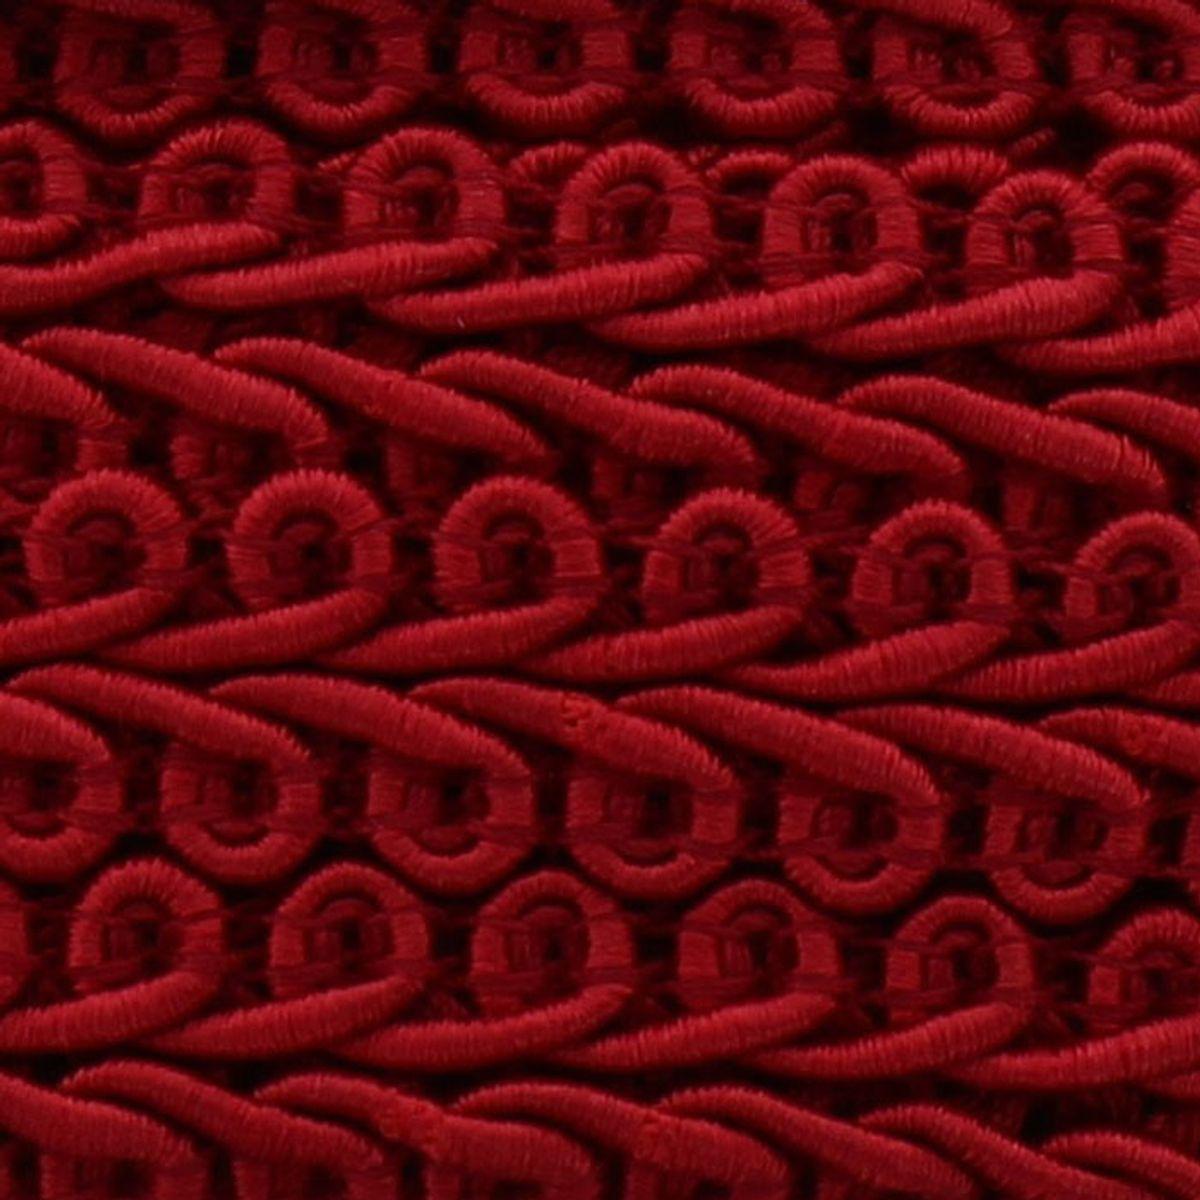 Galon épi style Chanel - Rouge hermès